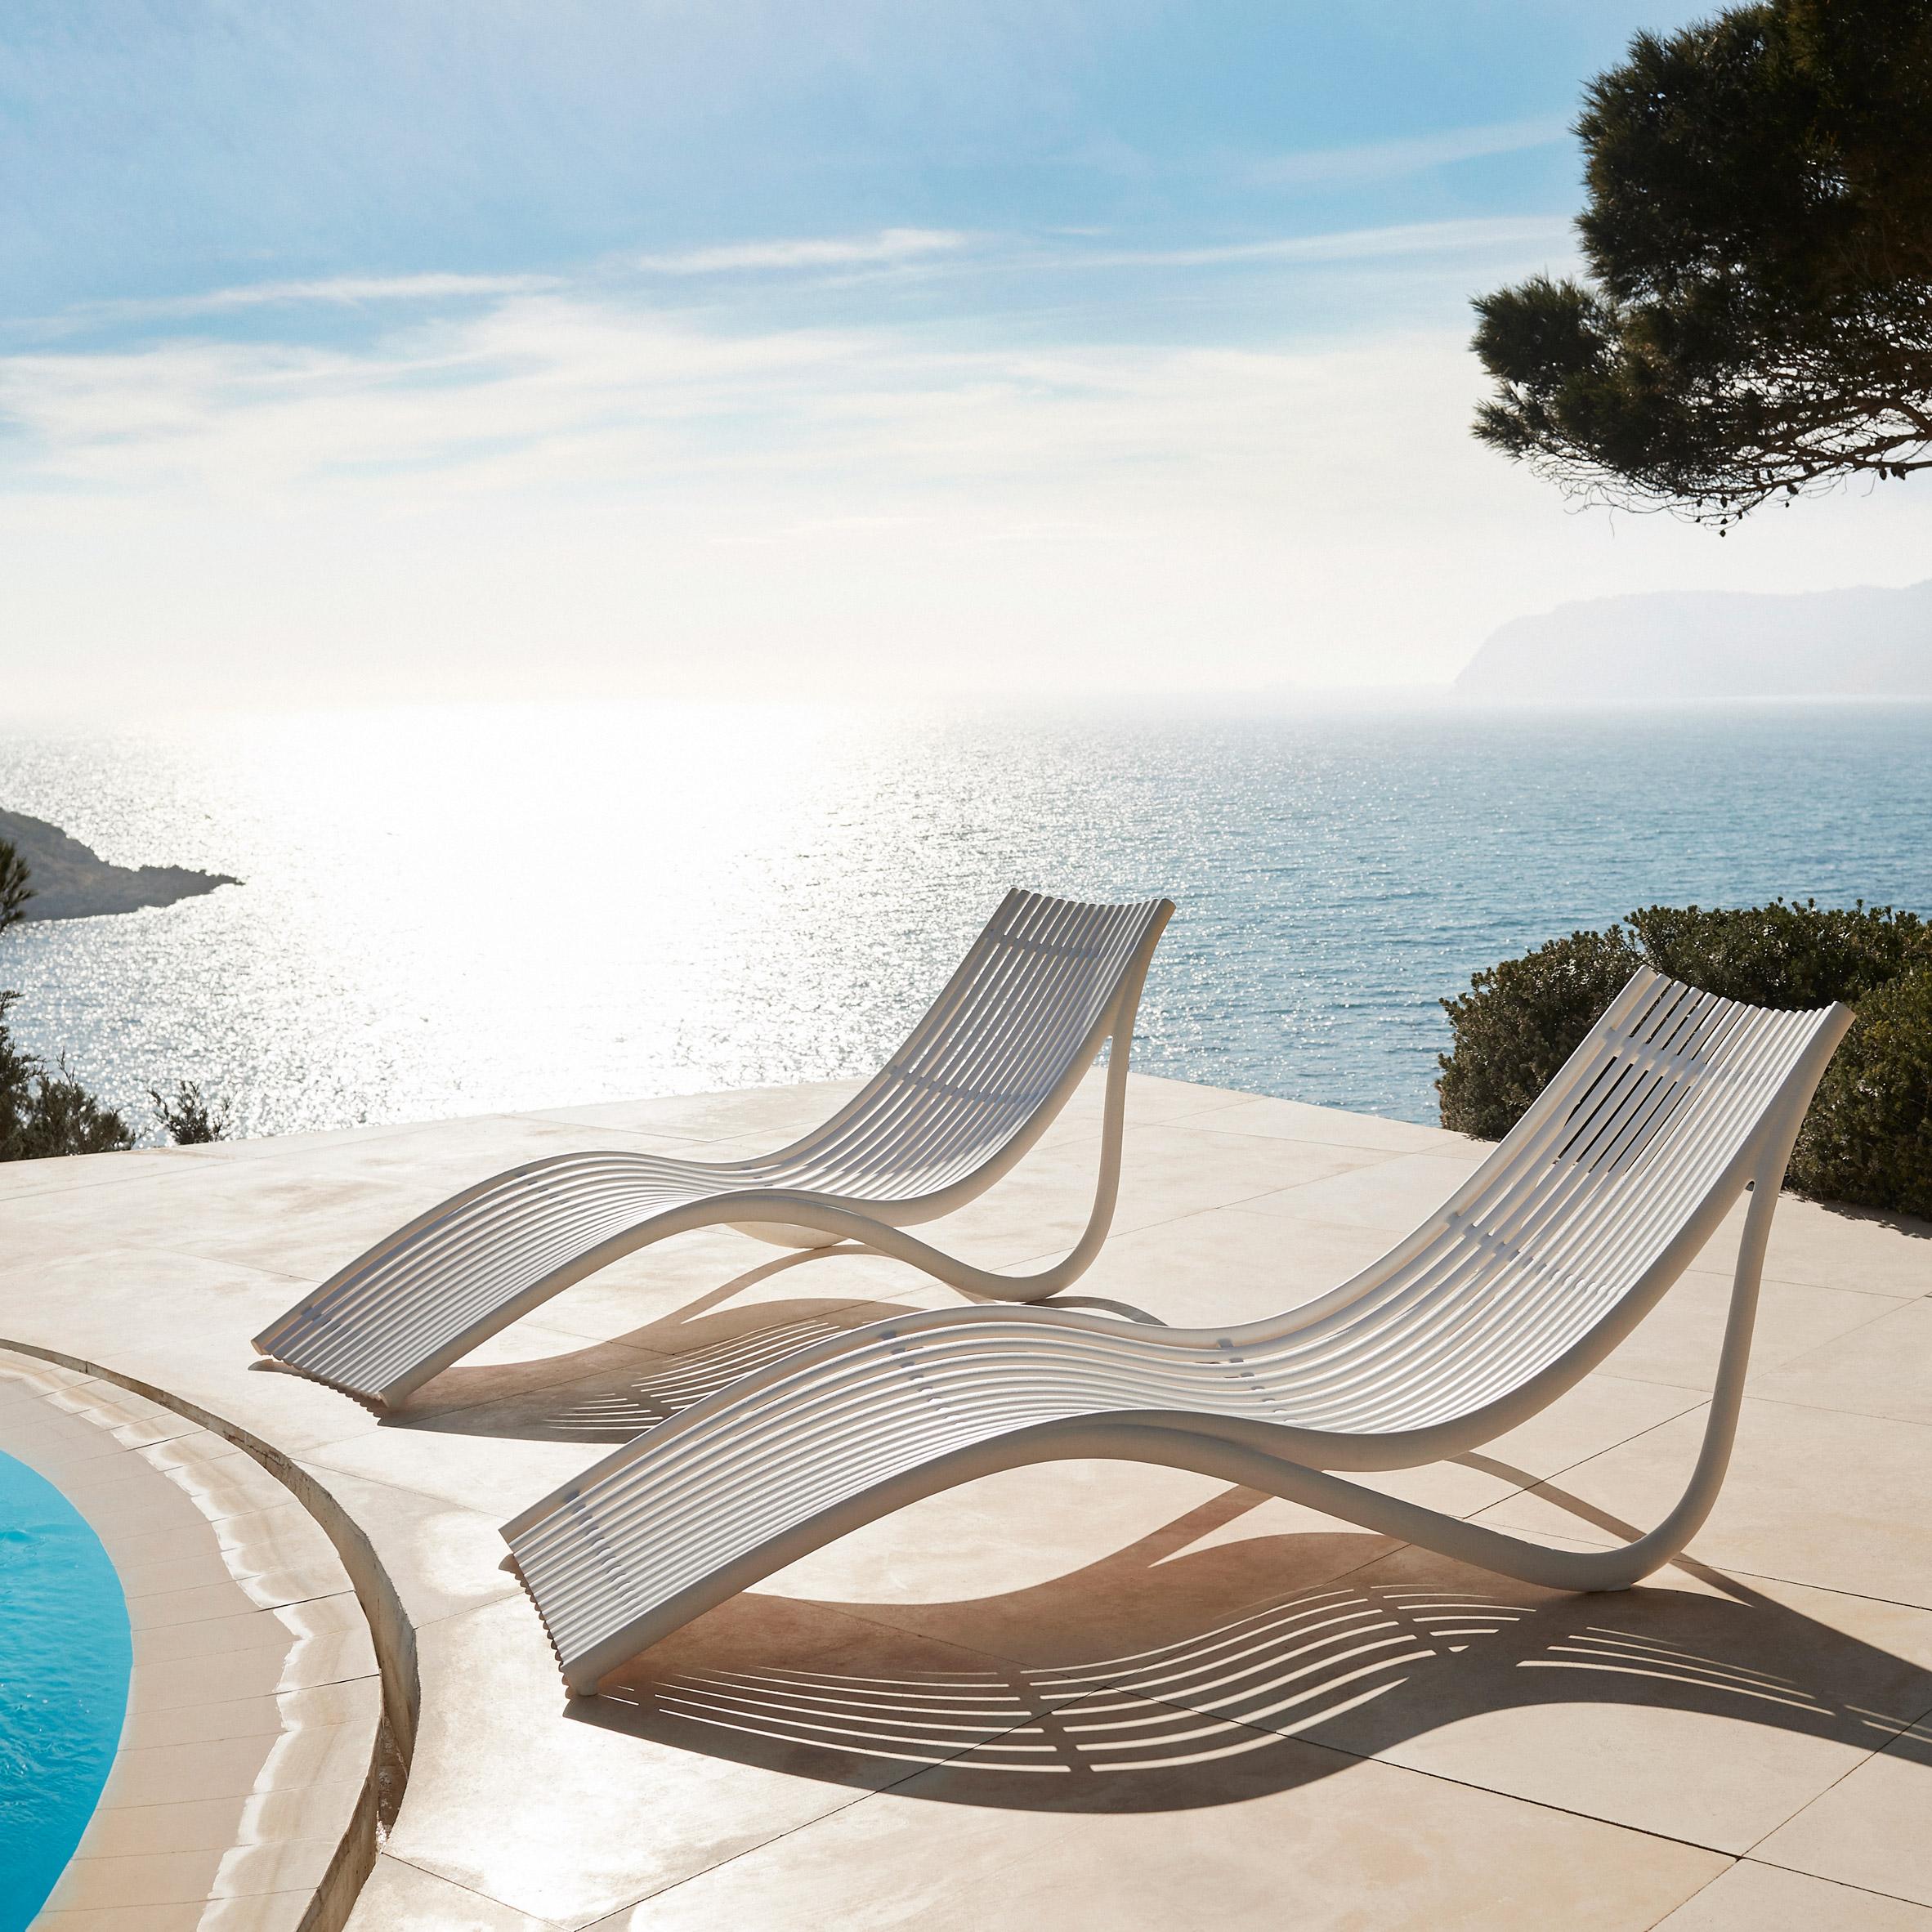 Ibiza lounger by Eugeni Quitllet for Vondom